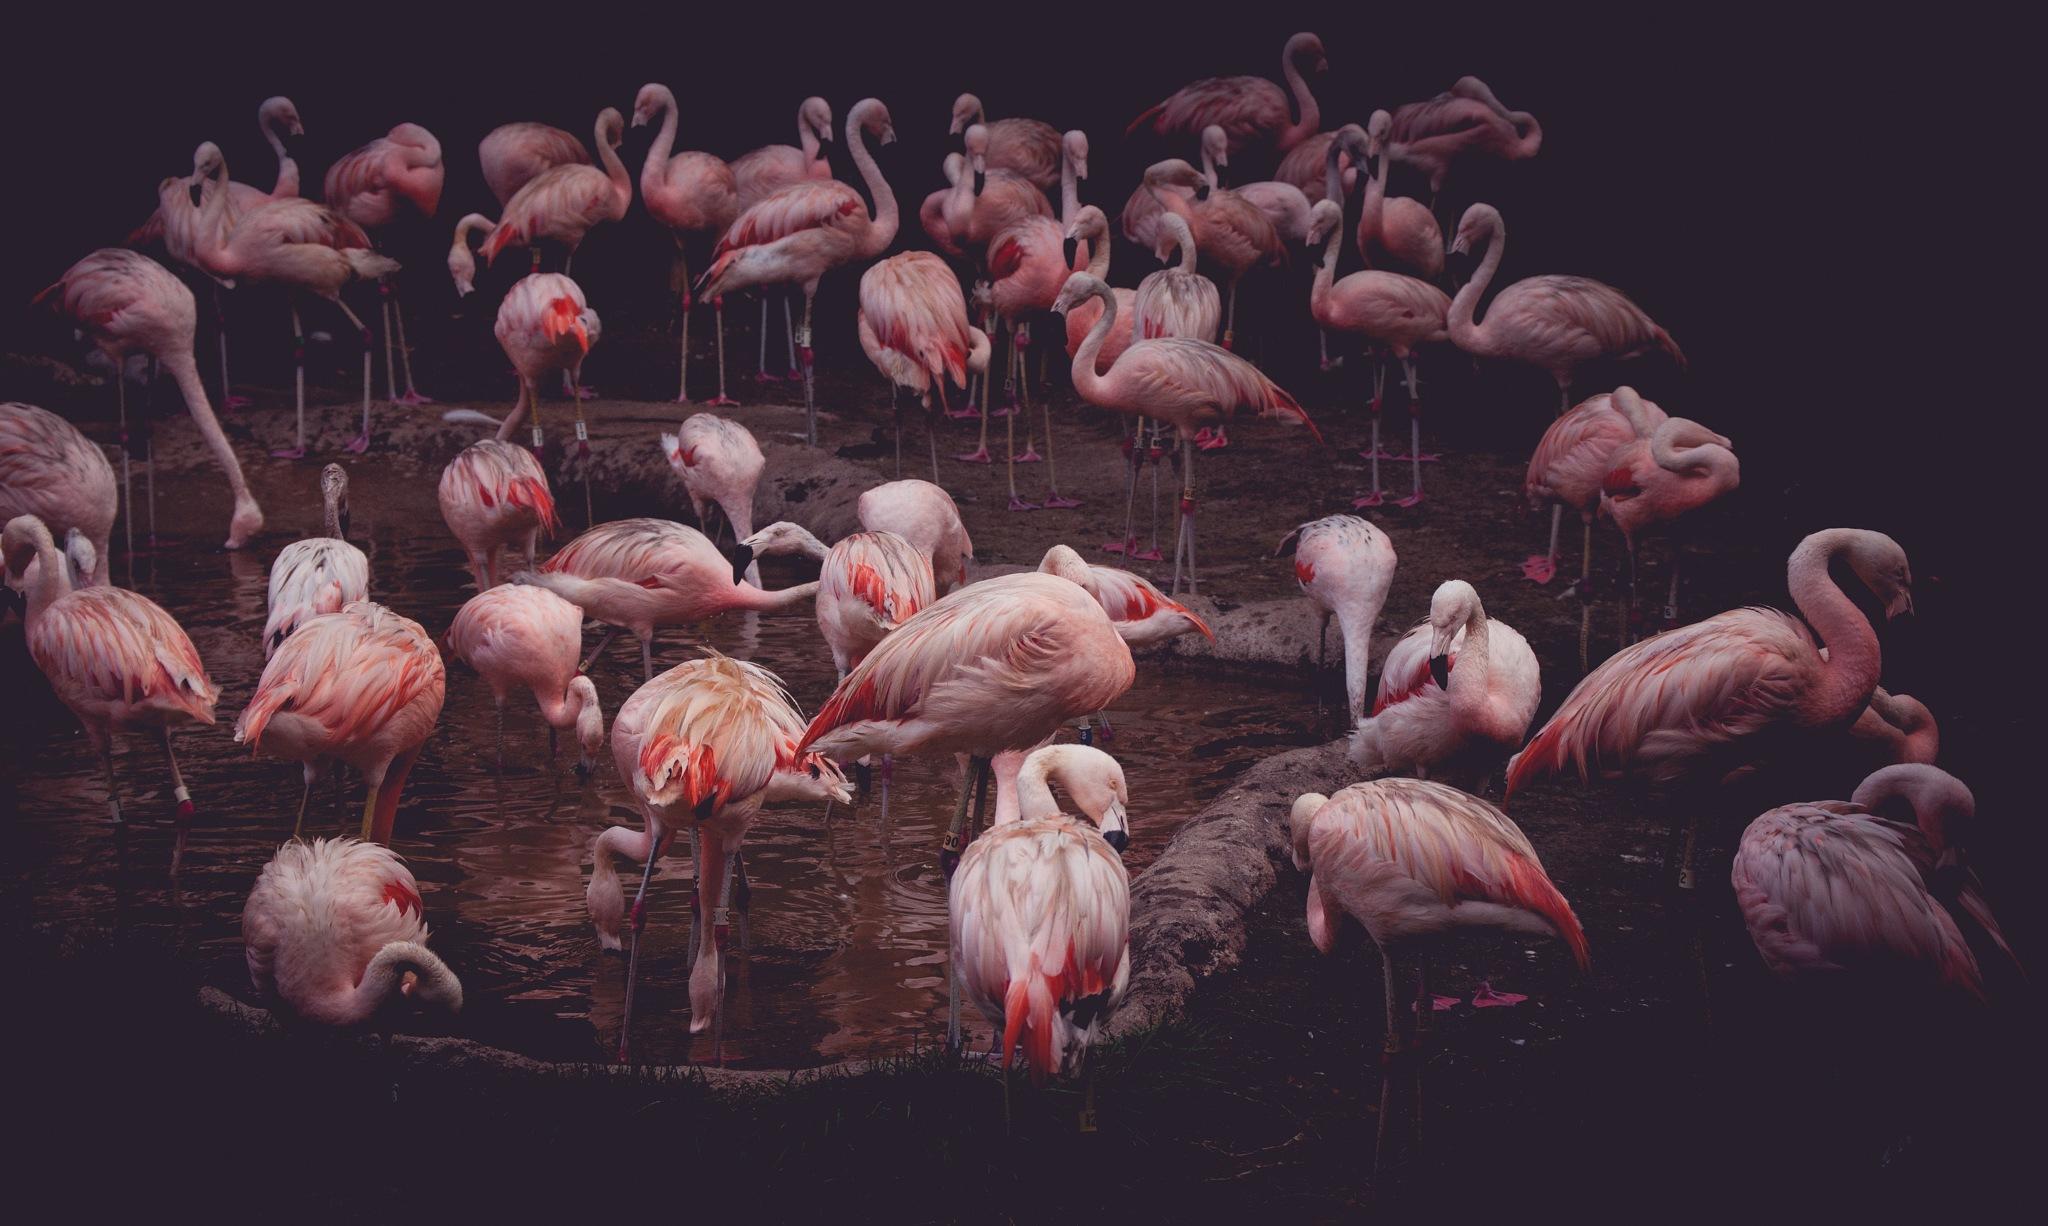 Flamingo's by AKarahan